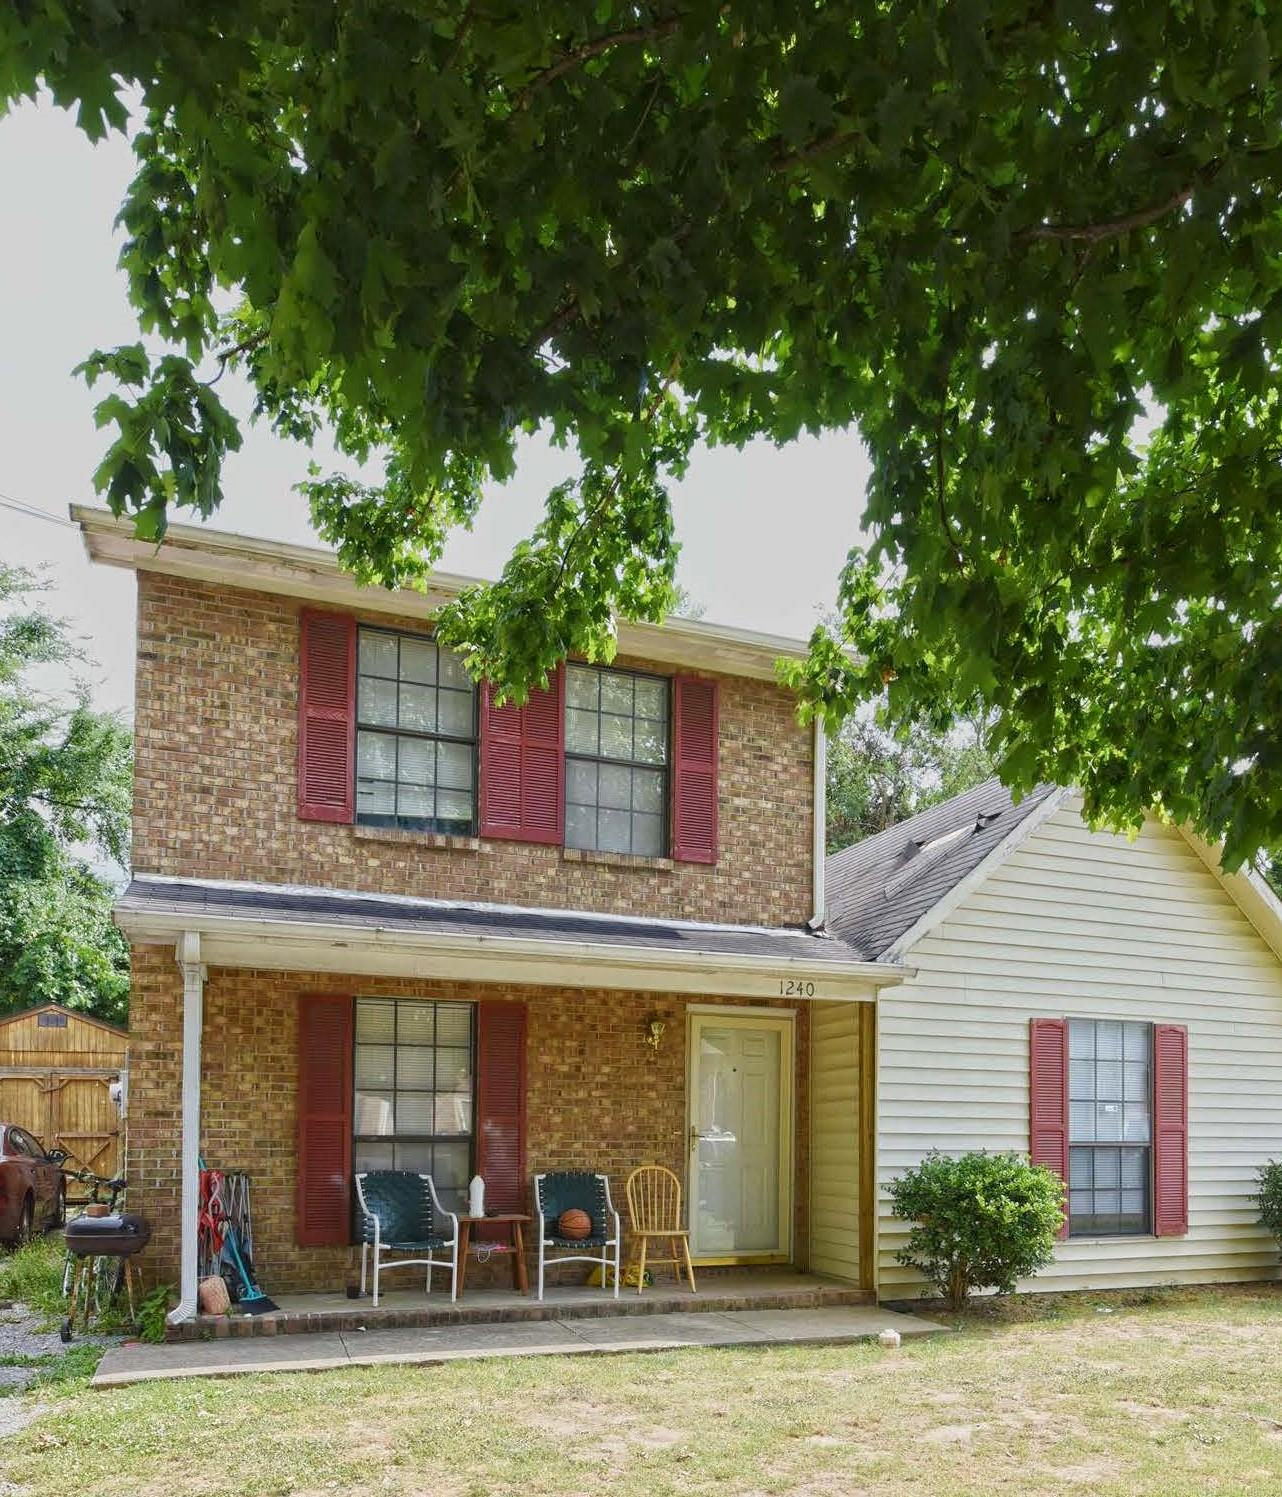 1240 Wenlon Dr, Murfreesboro, TN 37130